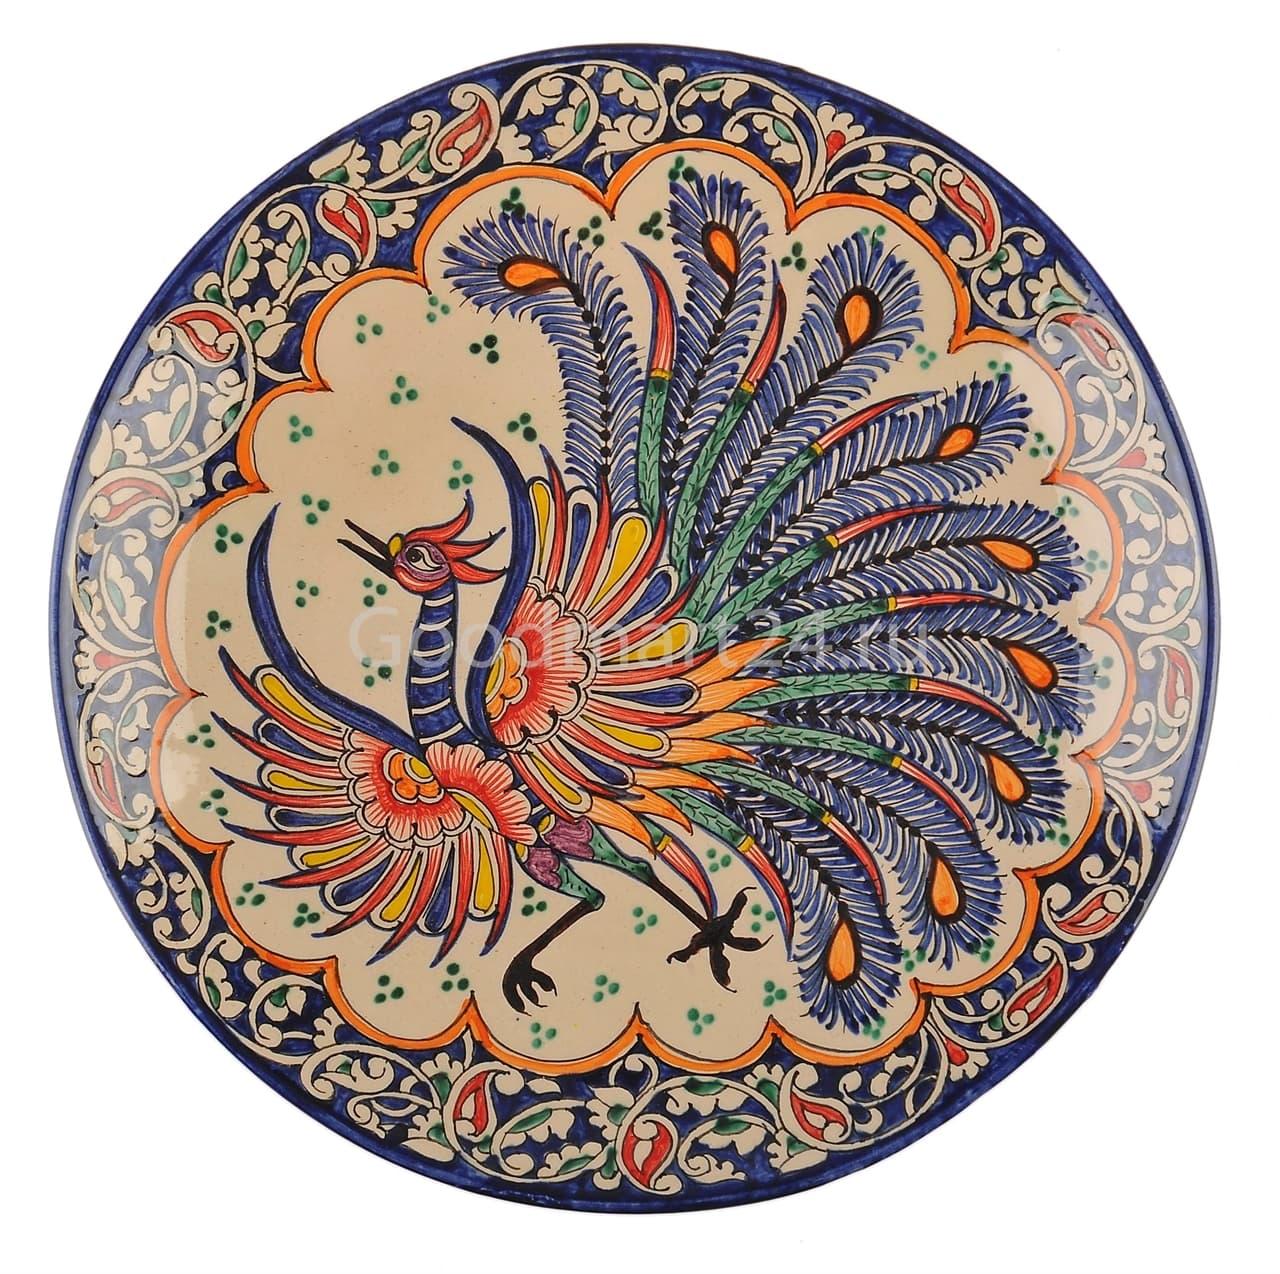 Ляган Риштанская Керамика 38 см. плоский, Жар-Птица - фото 7396